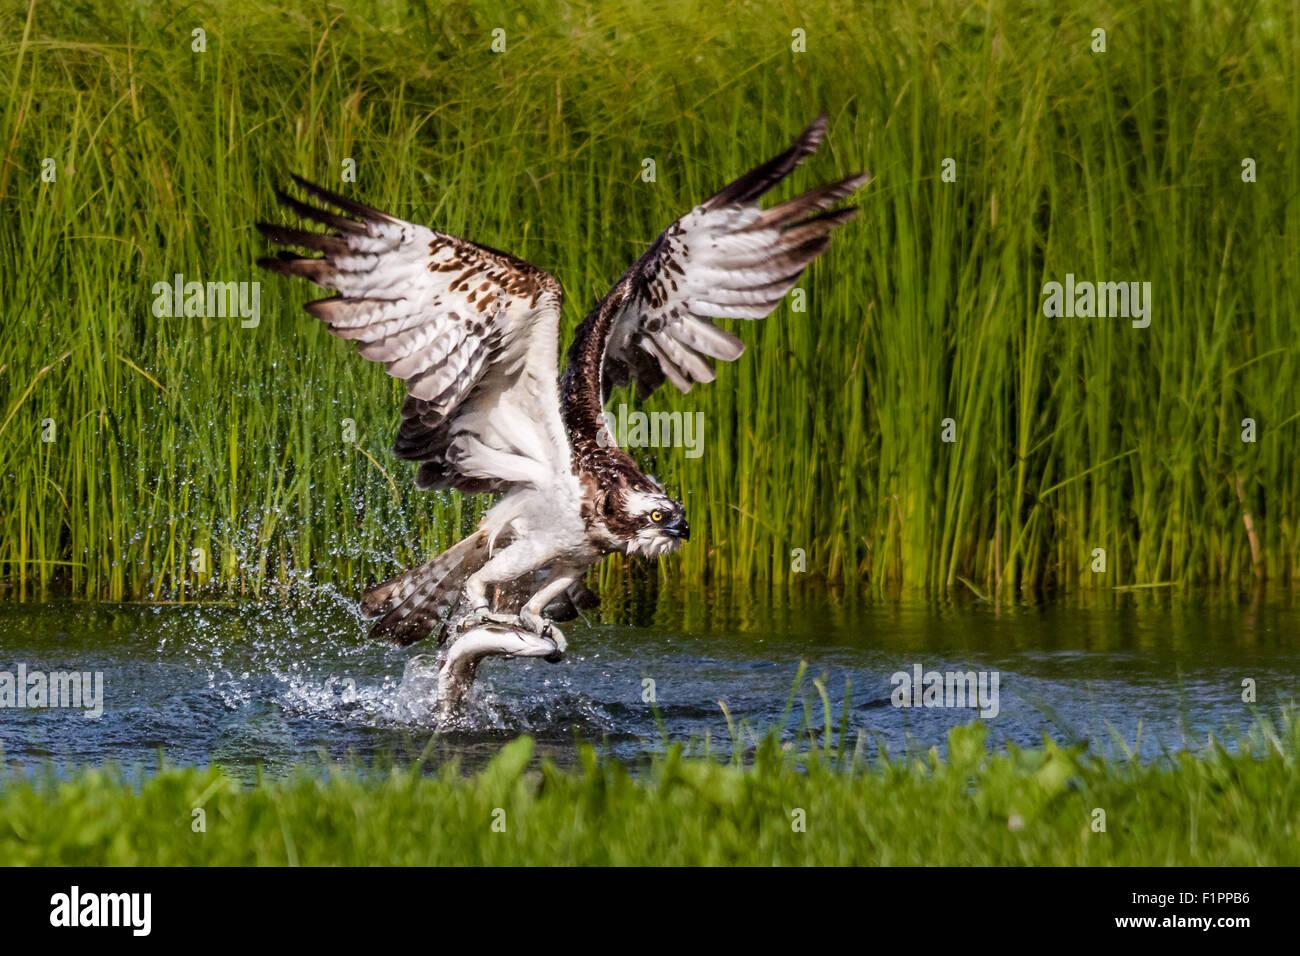 Osprey (Pandion haliaetus) catching fish. - Stock Image